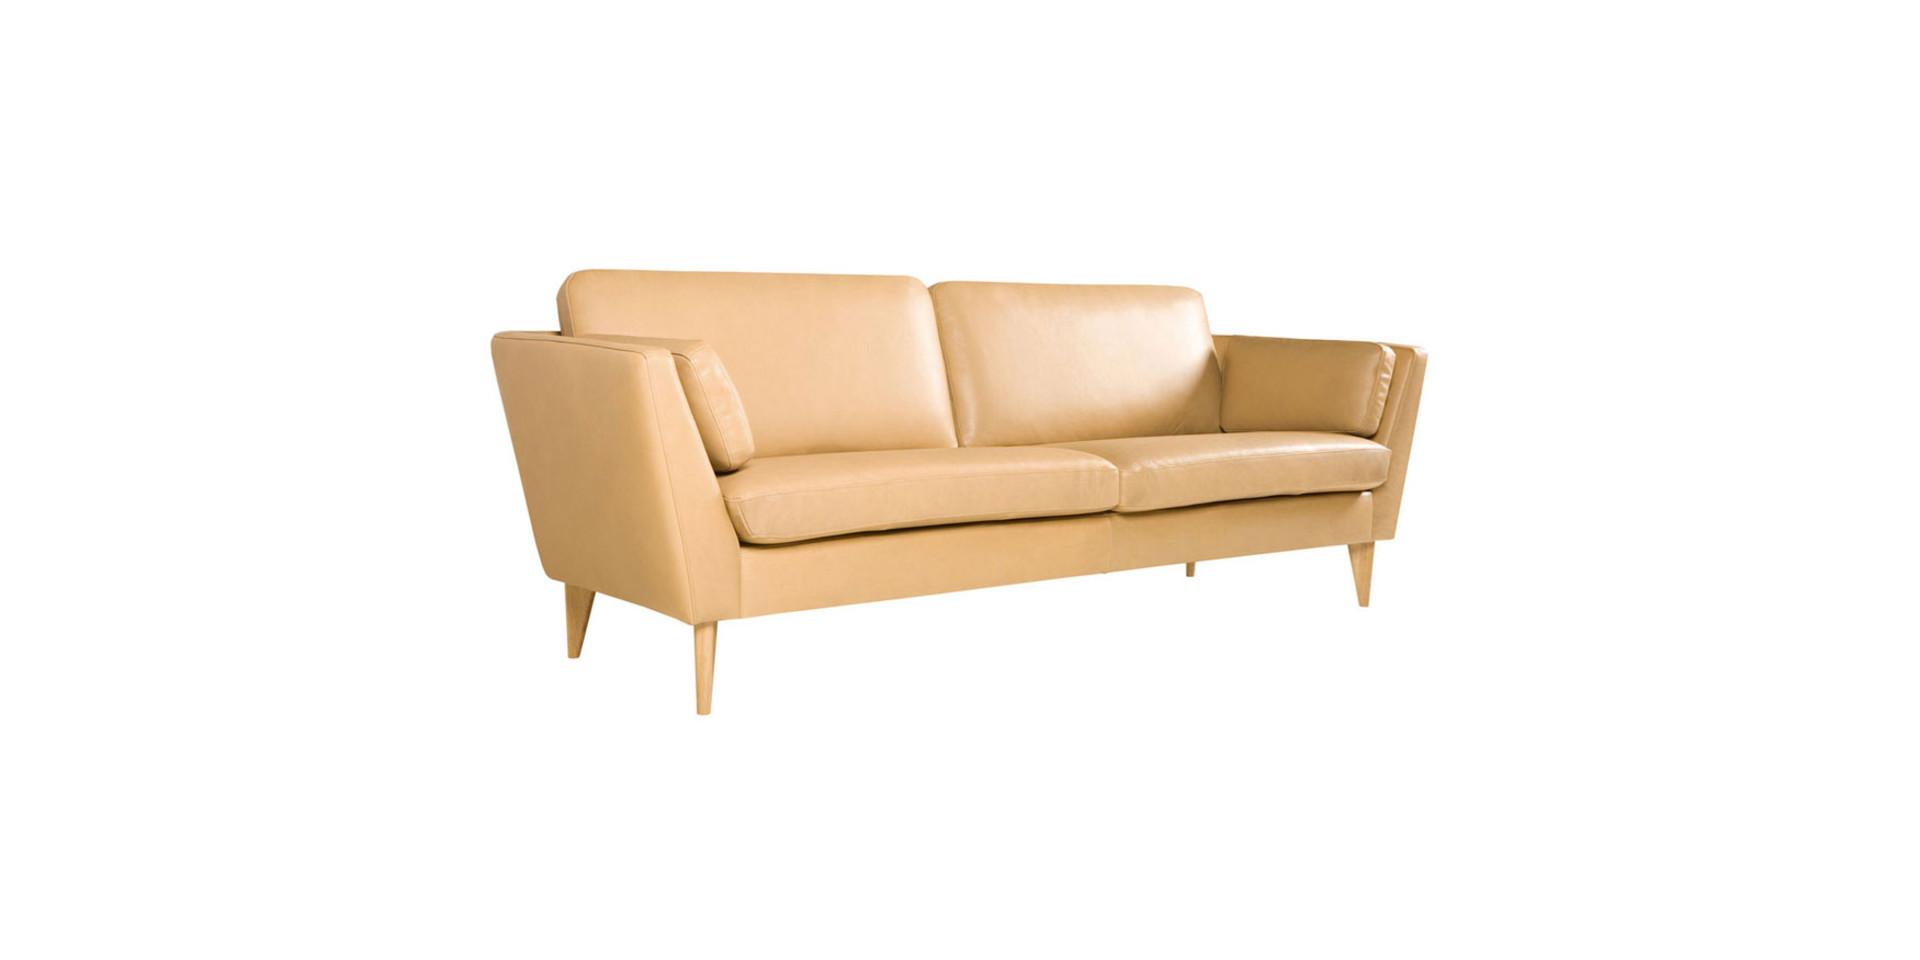 sits-mynta-canape-3seater_aniline_sabbia_4_0